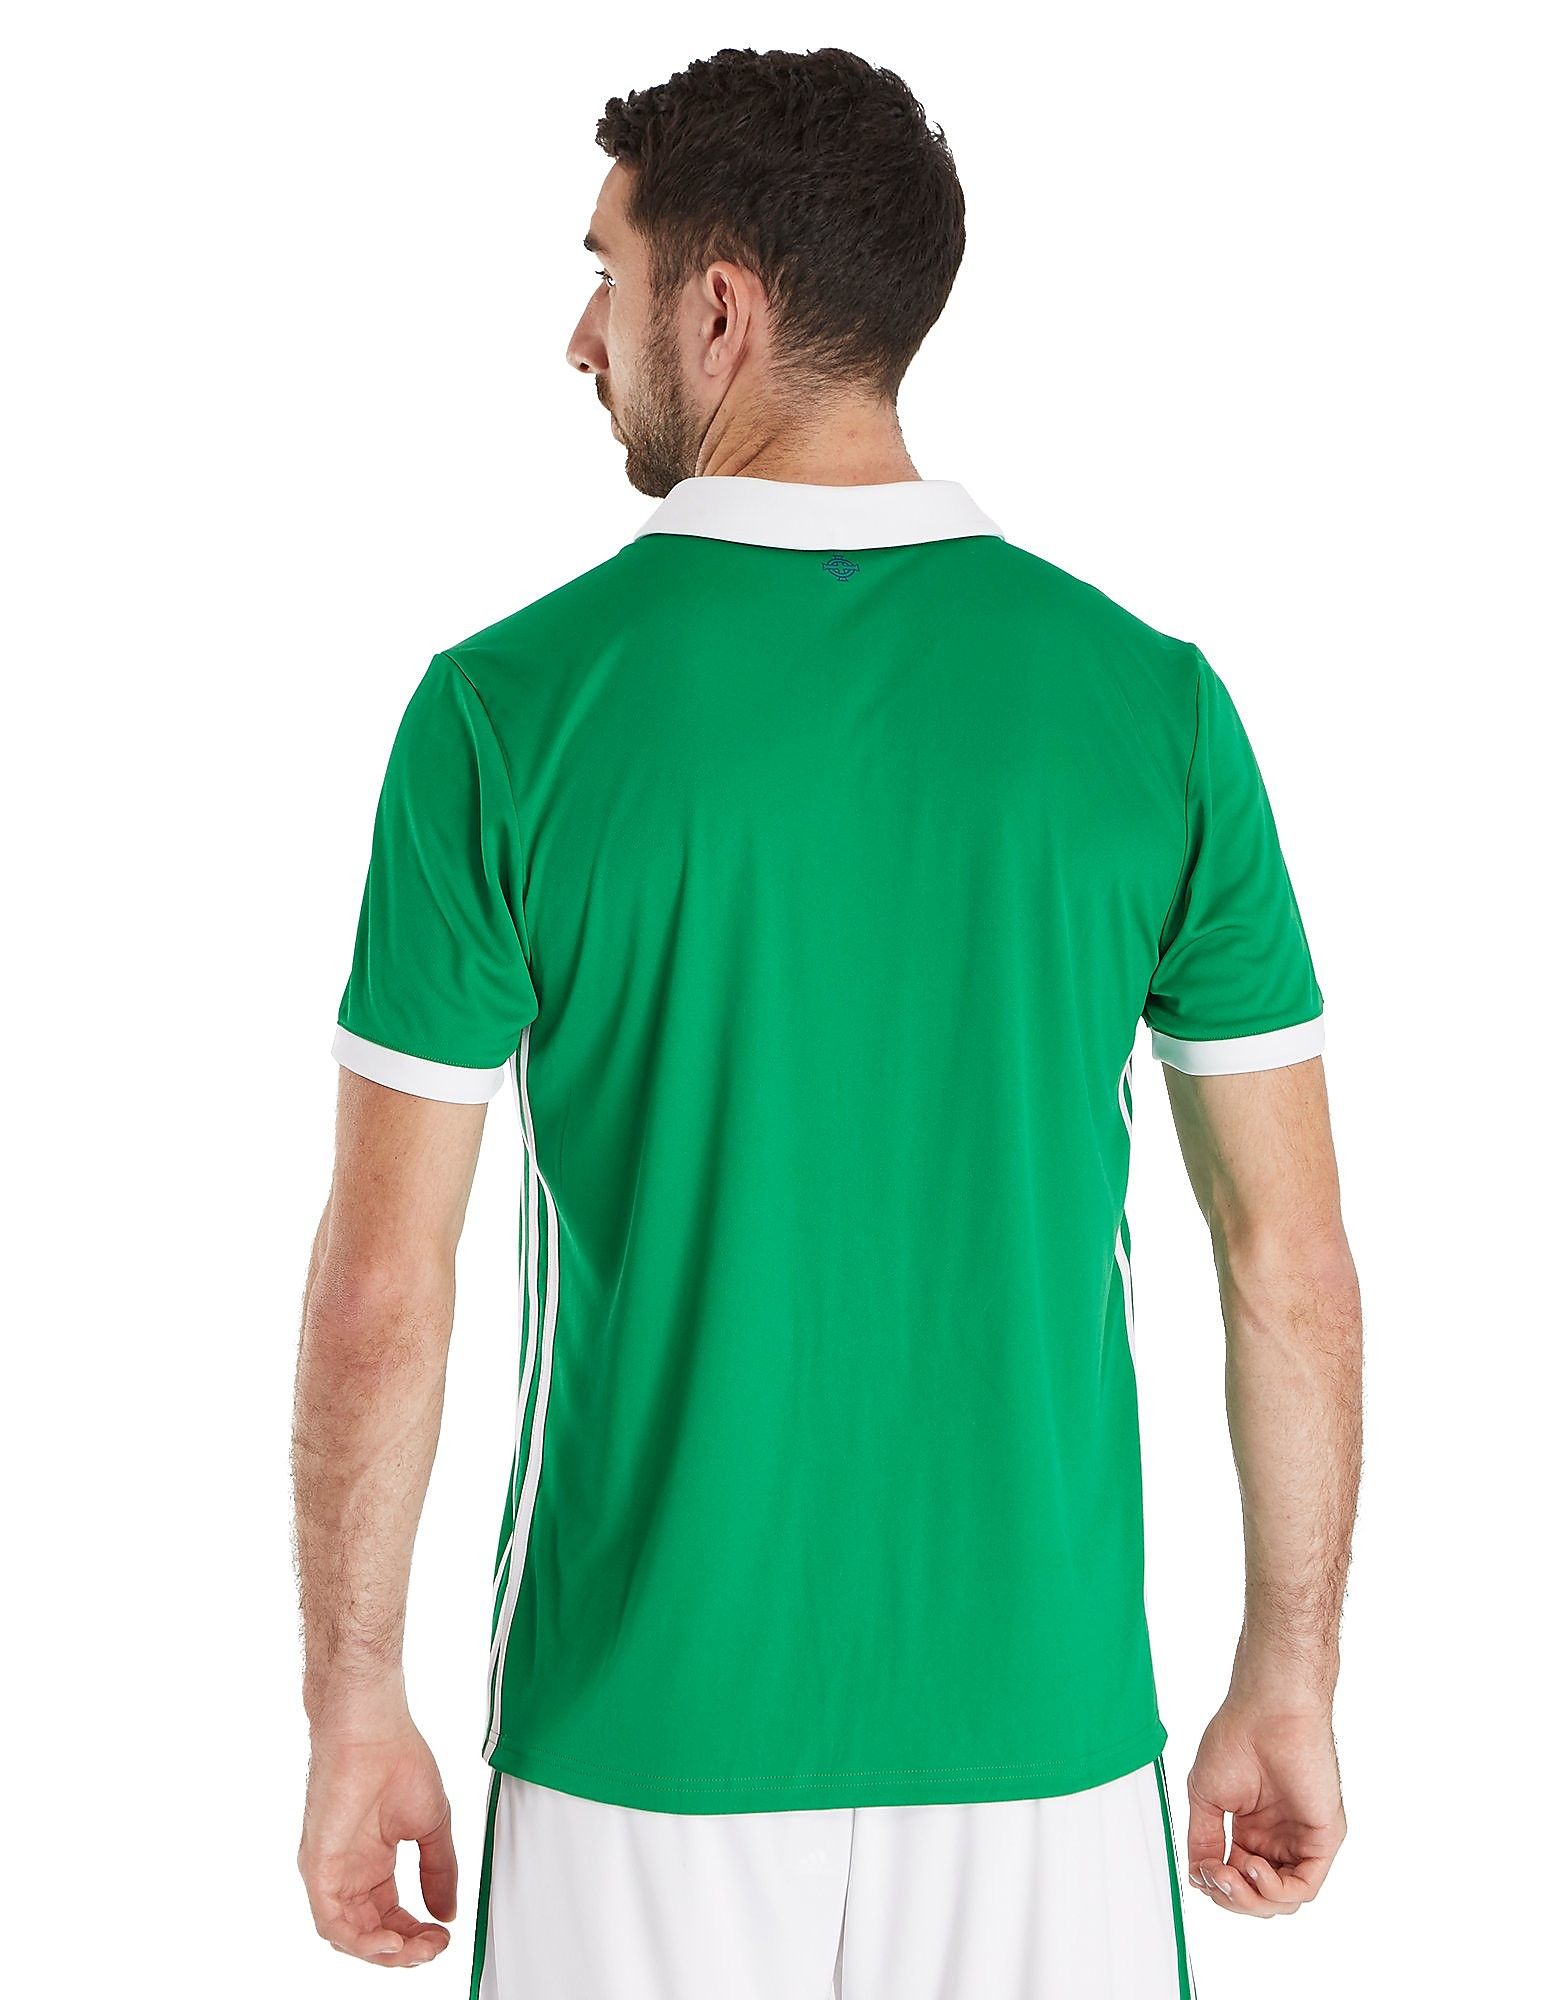 adidas Northern Ireland 2018 Home Shirt PRE ORDER